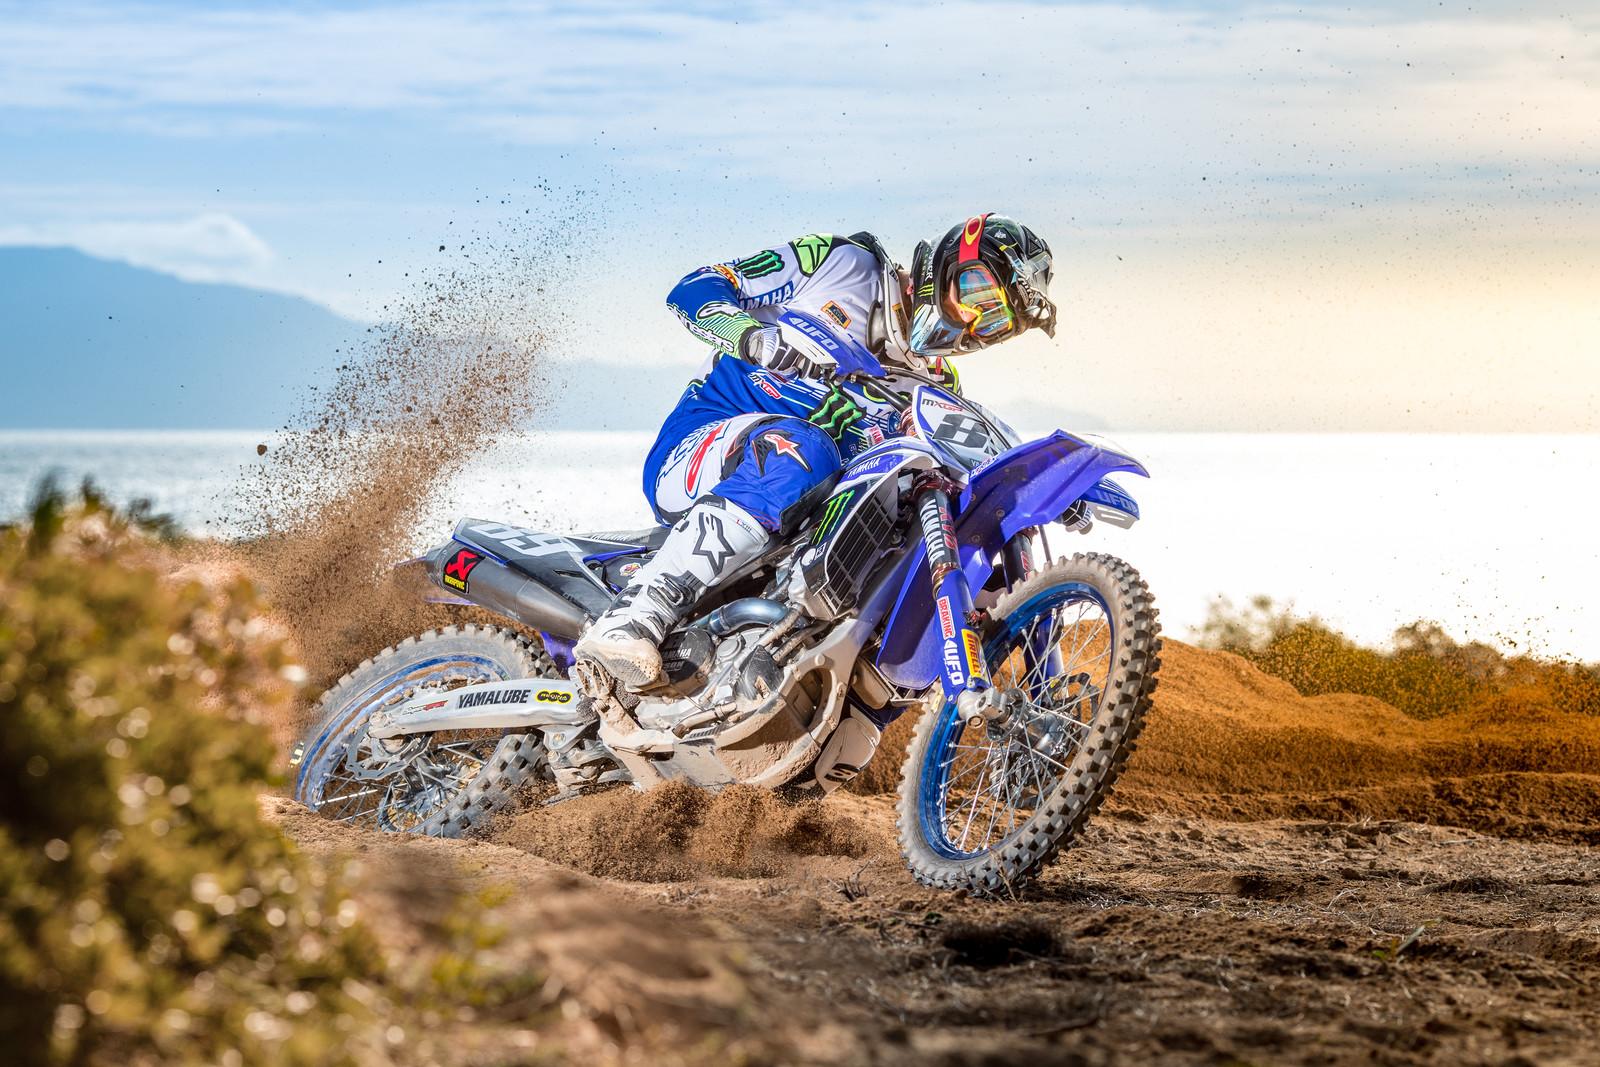 Jeremy van Horebeek - First Look: 2017 Monster Energy & Wilvo Yamaha MXGP Teams - Motocross Pictures - Vital MX